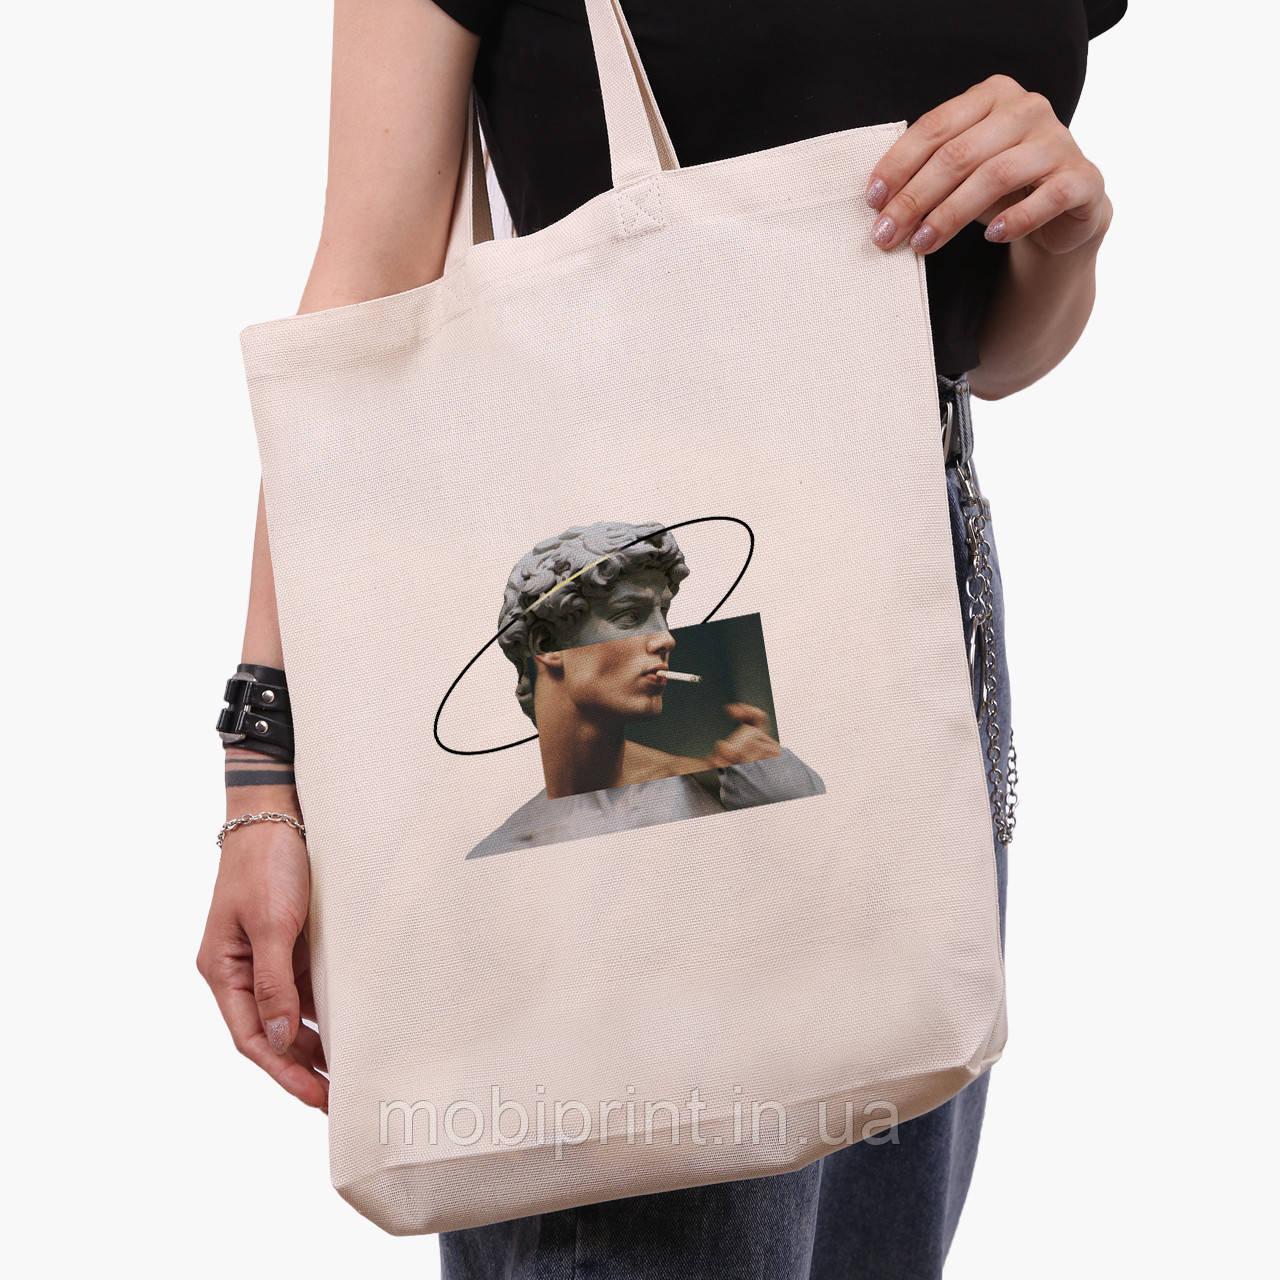 Эко сумка шоппер белая Давид Микеланджело - Ренессанс (David Michelangelo) (9227-1201-1)  экосумка шопер